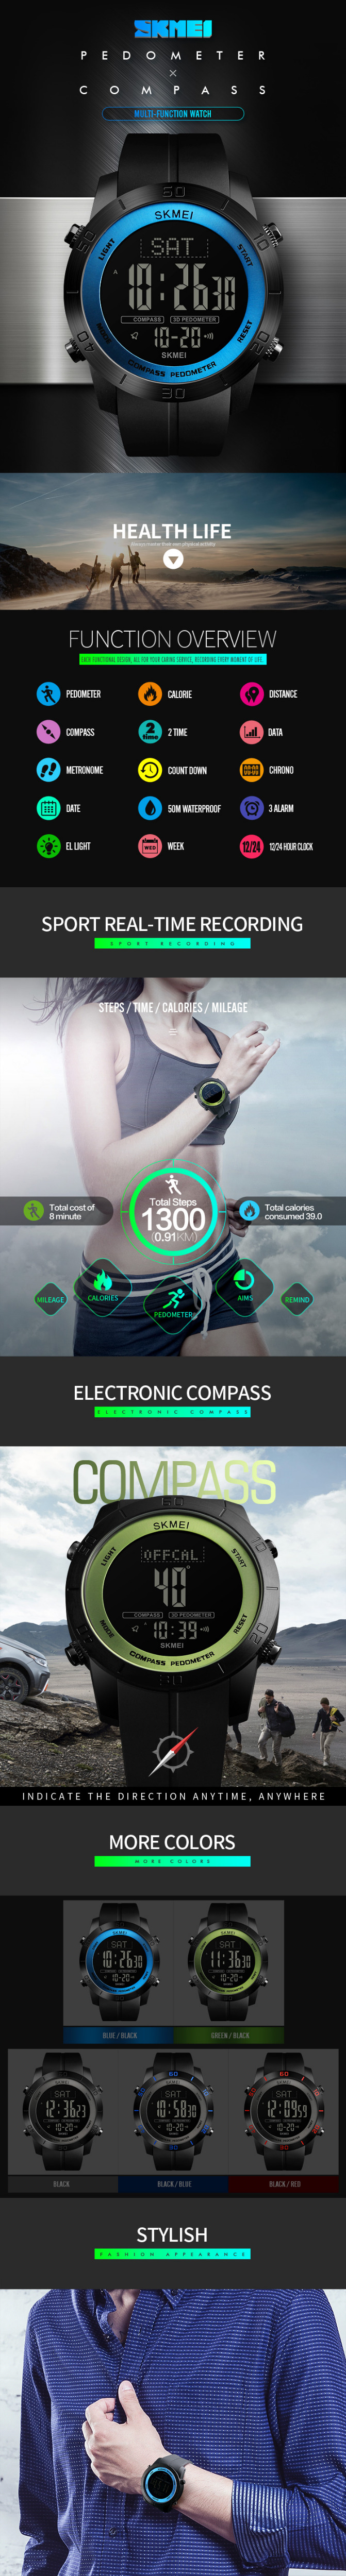 Zk30 Compass Outdoor Sports Watches Men Countdown Chronograph Alarm Watch Waterproof Digital Wristwatches Relogio Masculino 1300 Men's Watches